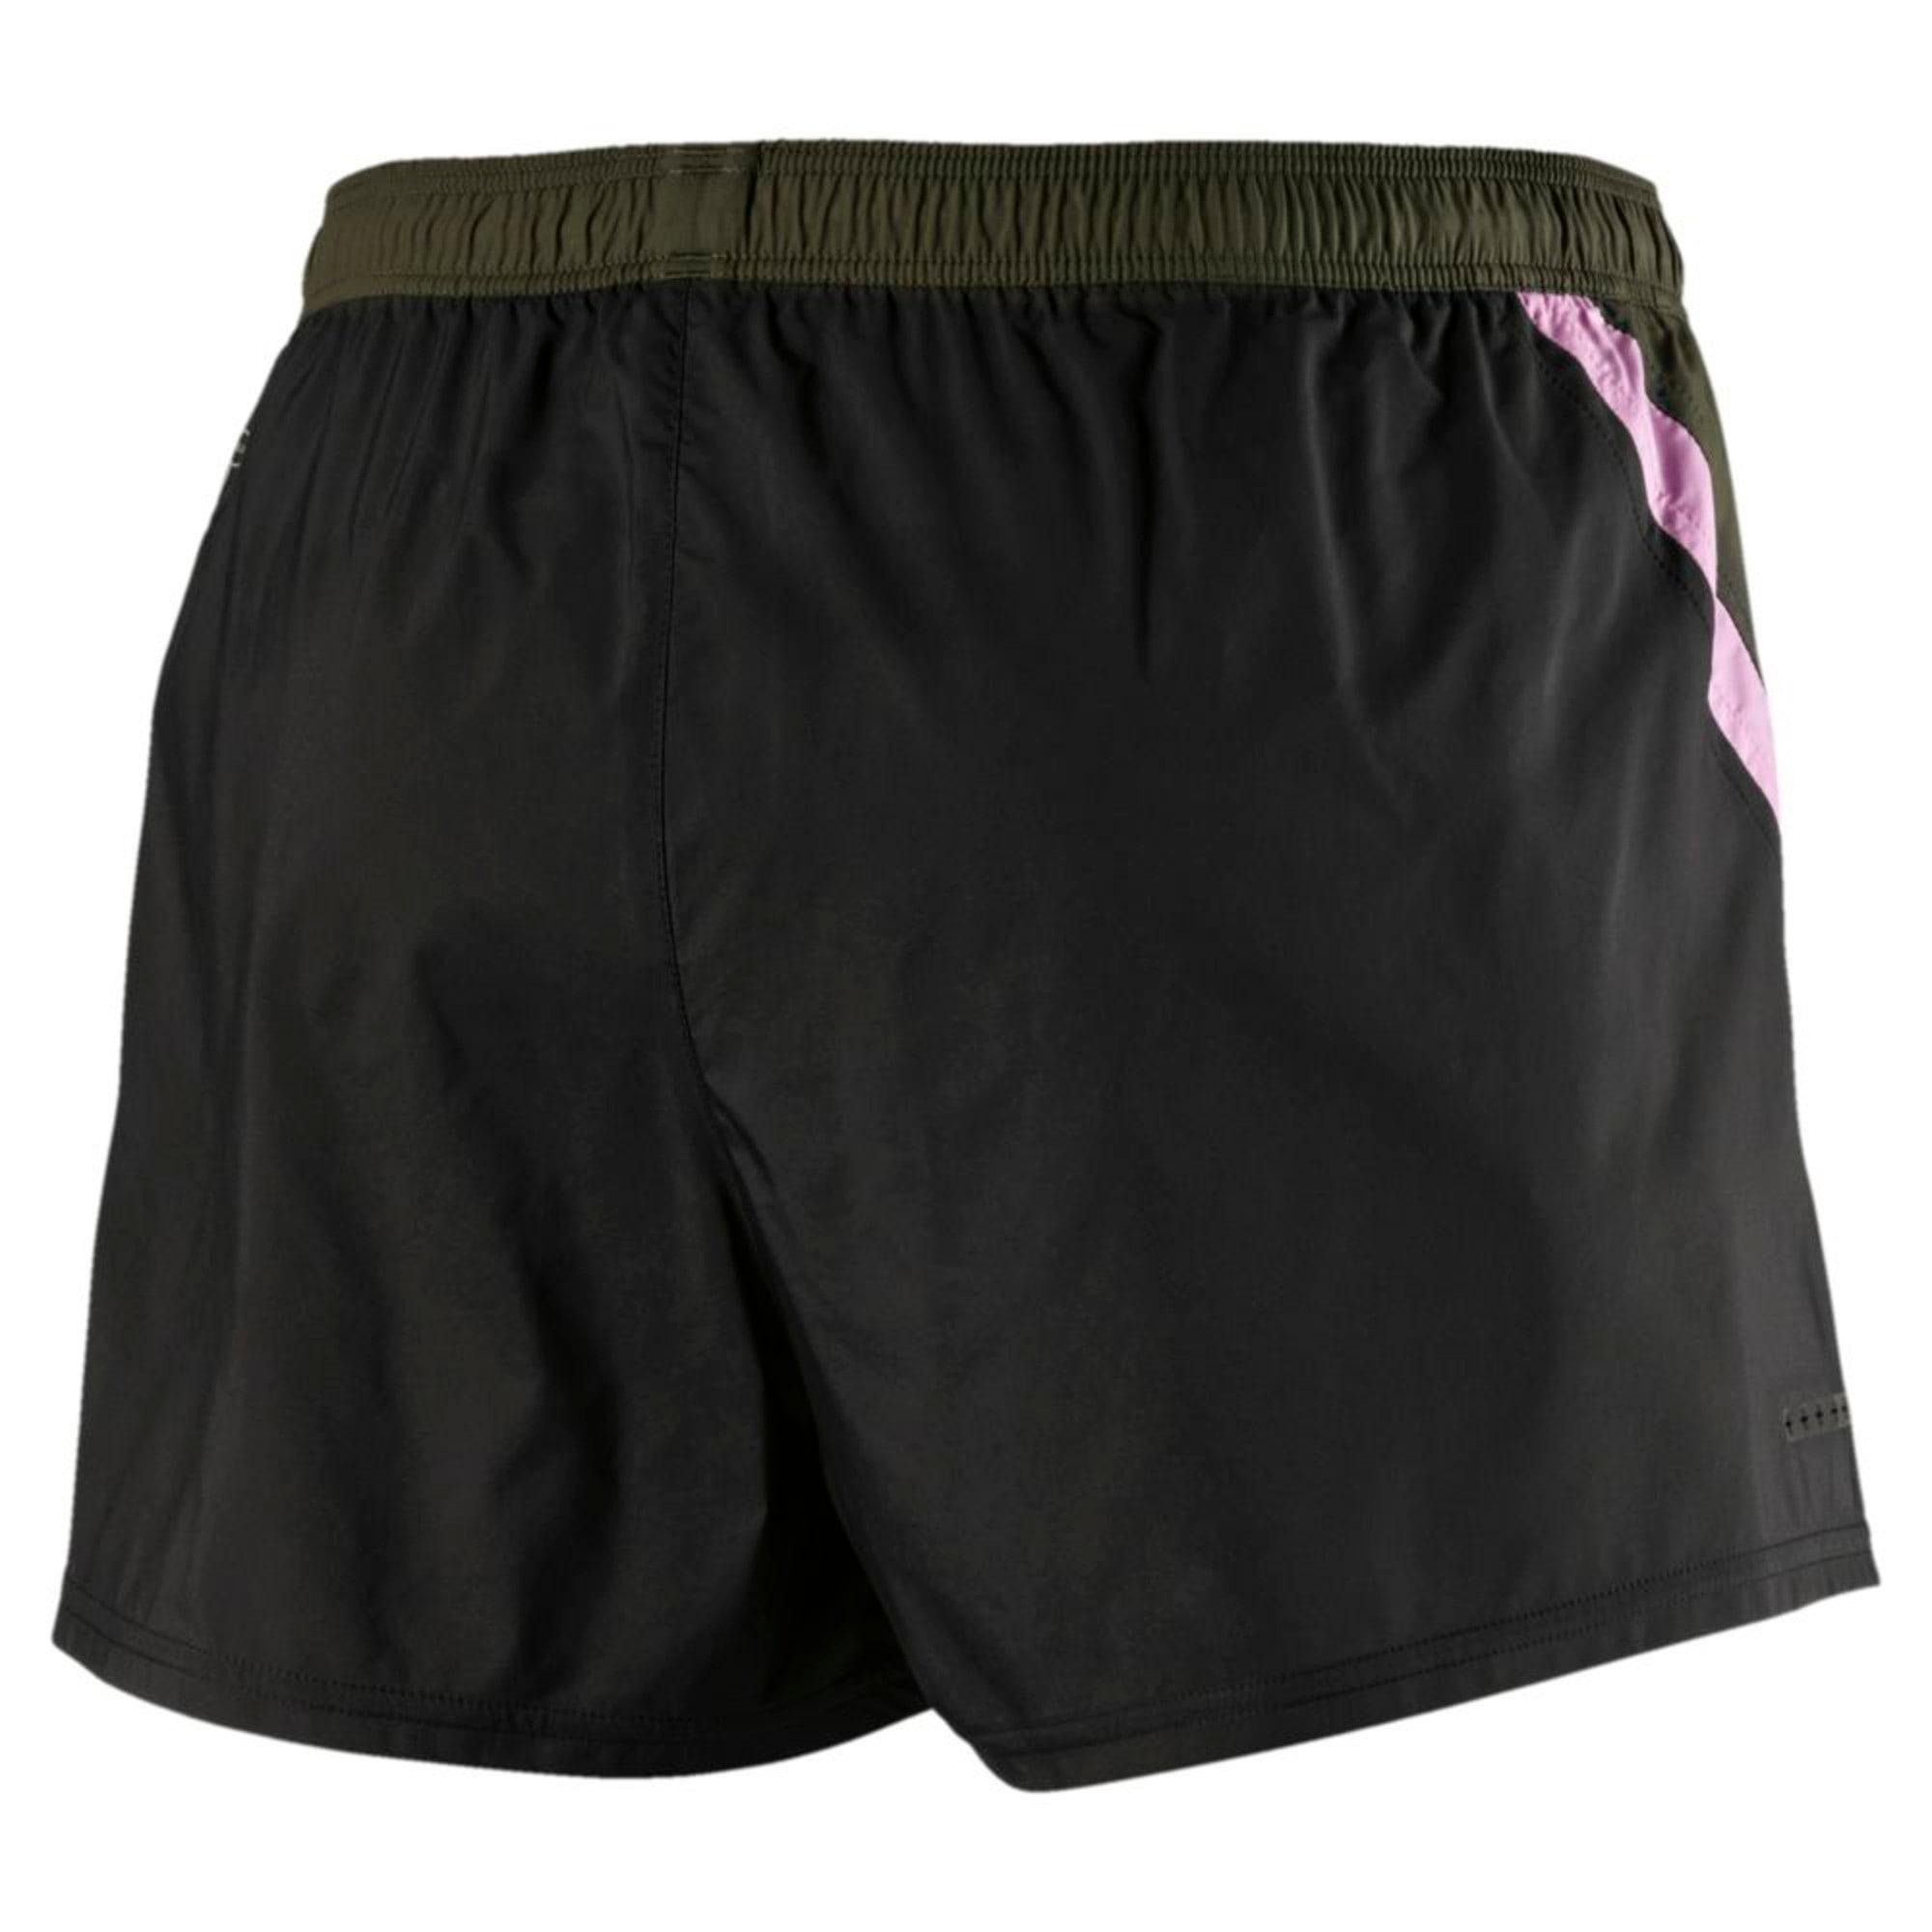 Thumbnail 2 of Blast 3'' Women's Training Shorts, Forest Night, medium-IND